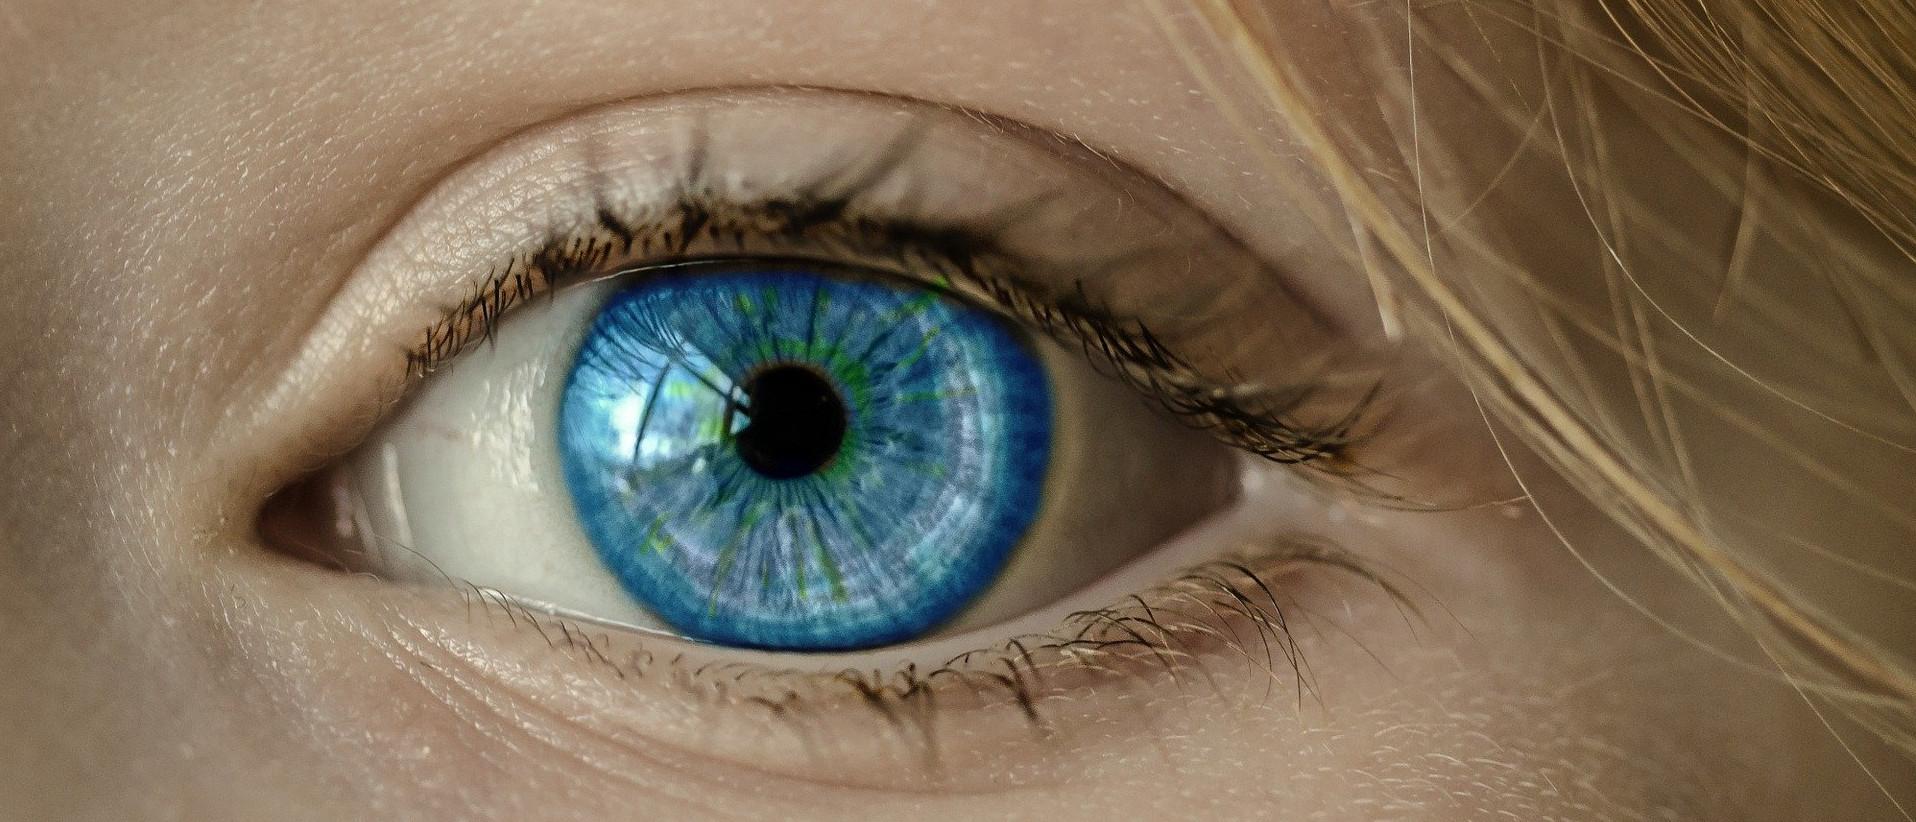 Internetwerbung Augenoptiker